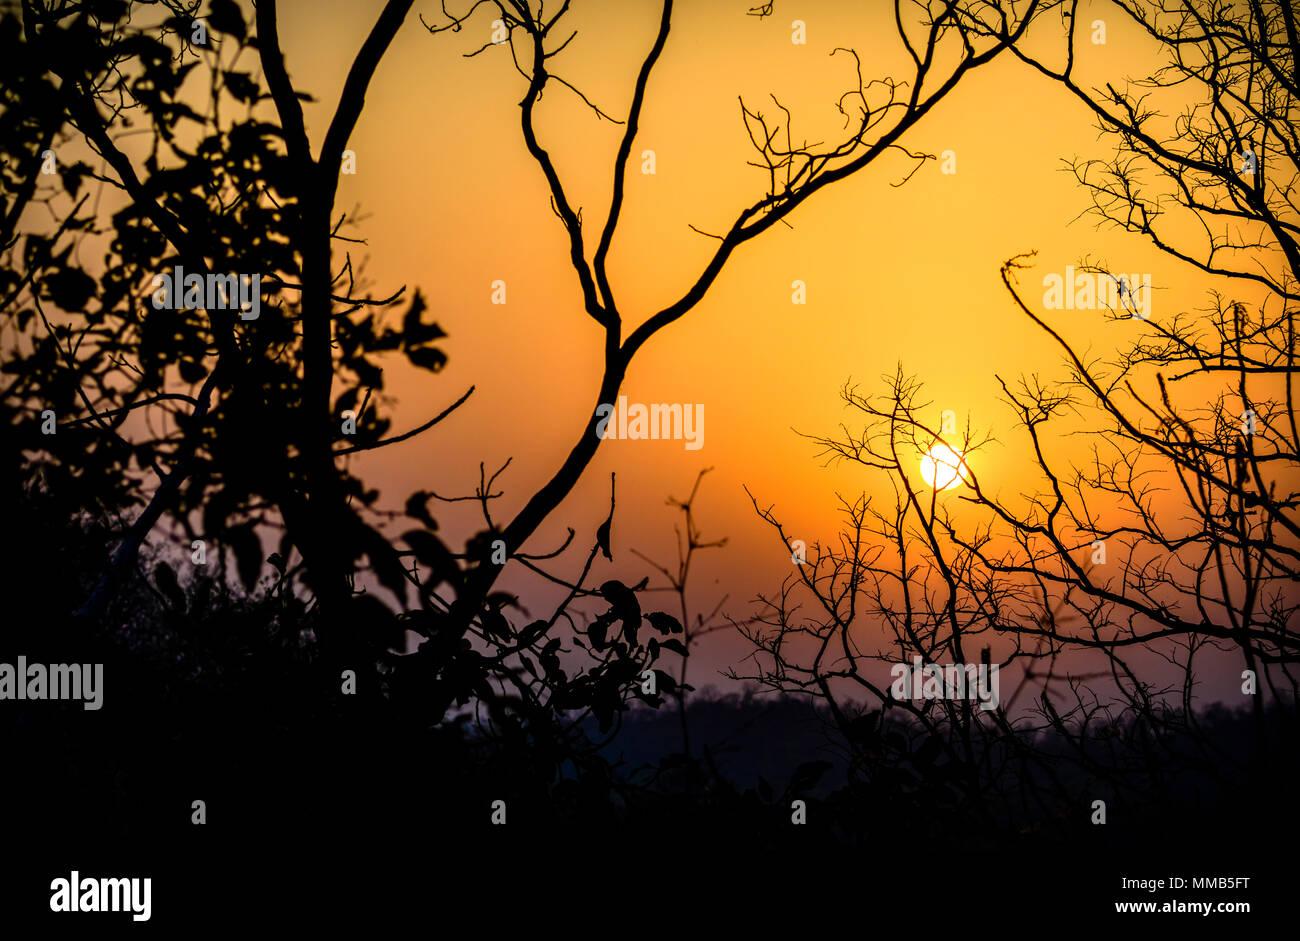 Sun rising in Bandhavgarh National Park, Madhya Pradesh India Stock Photo